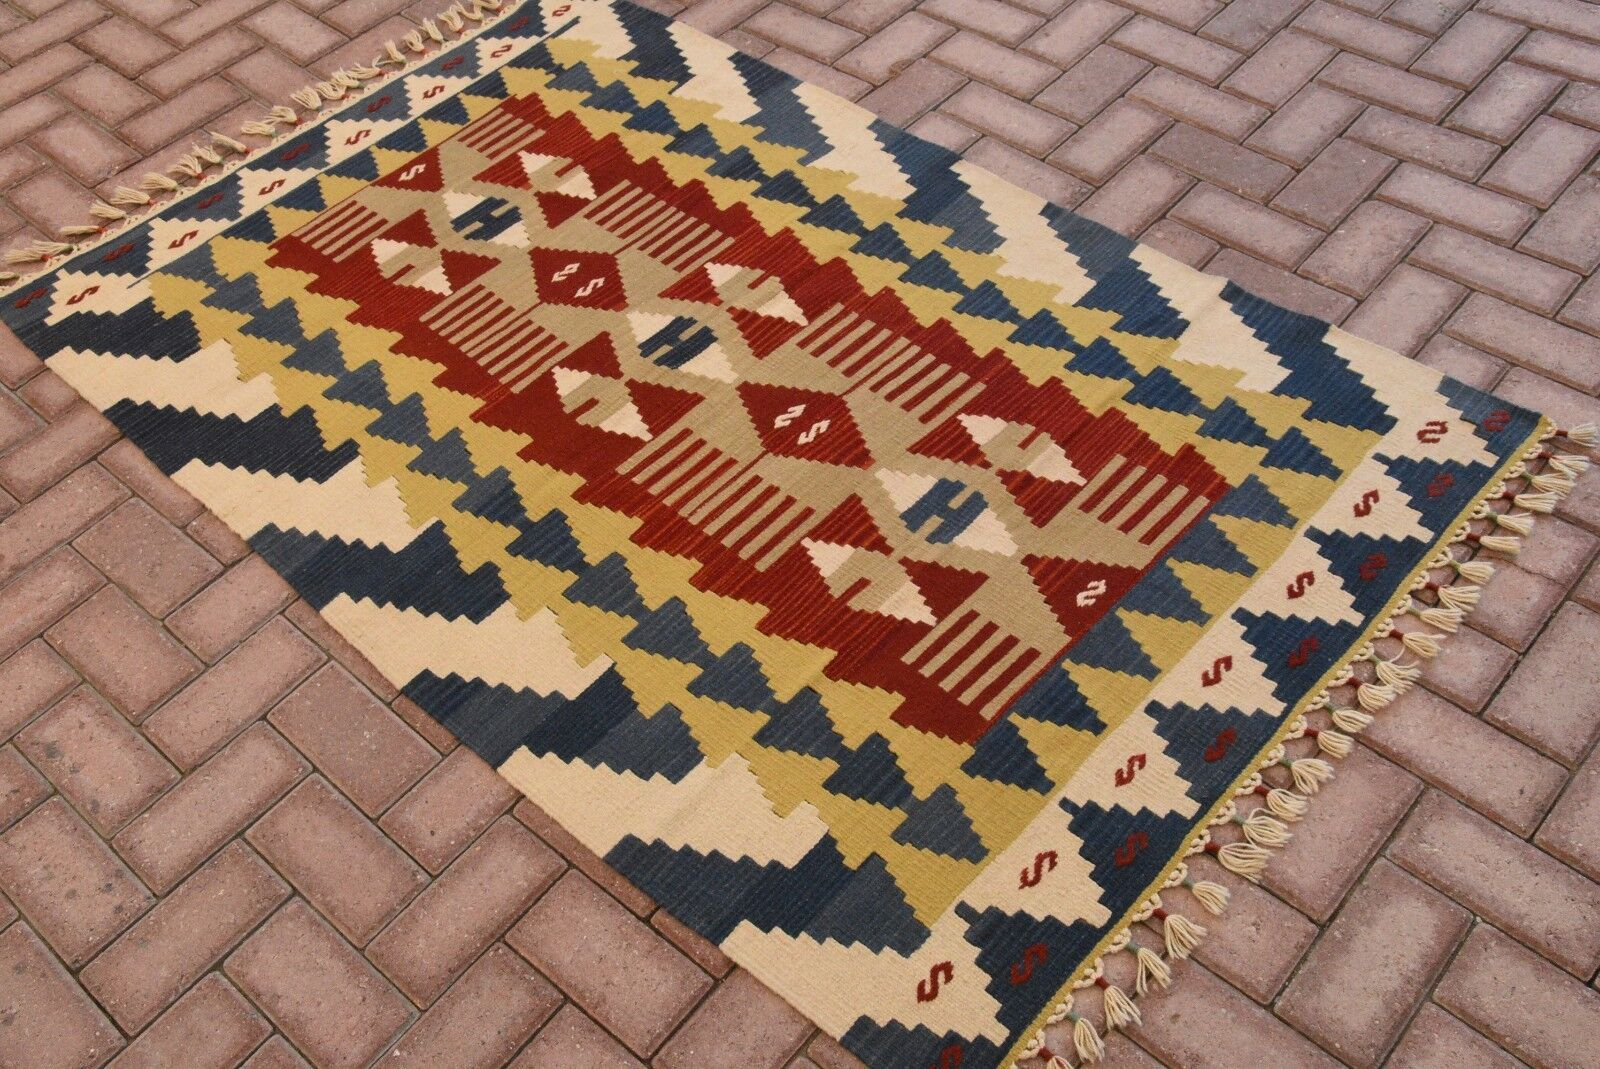 Turkish Handwoven Anatolian Wool Floor Carpet Carpet Carpet Handmade Antique Kilim Rug 4x6 ft 7d4101